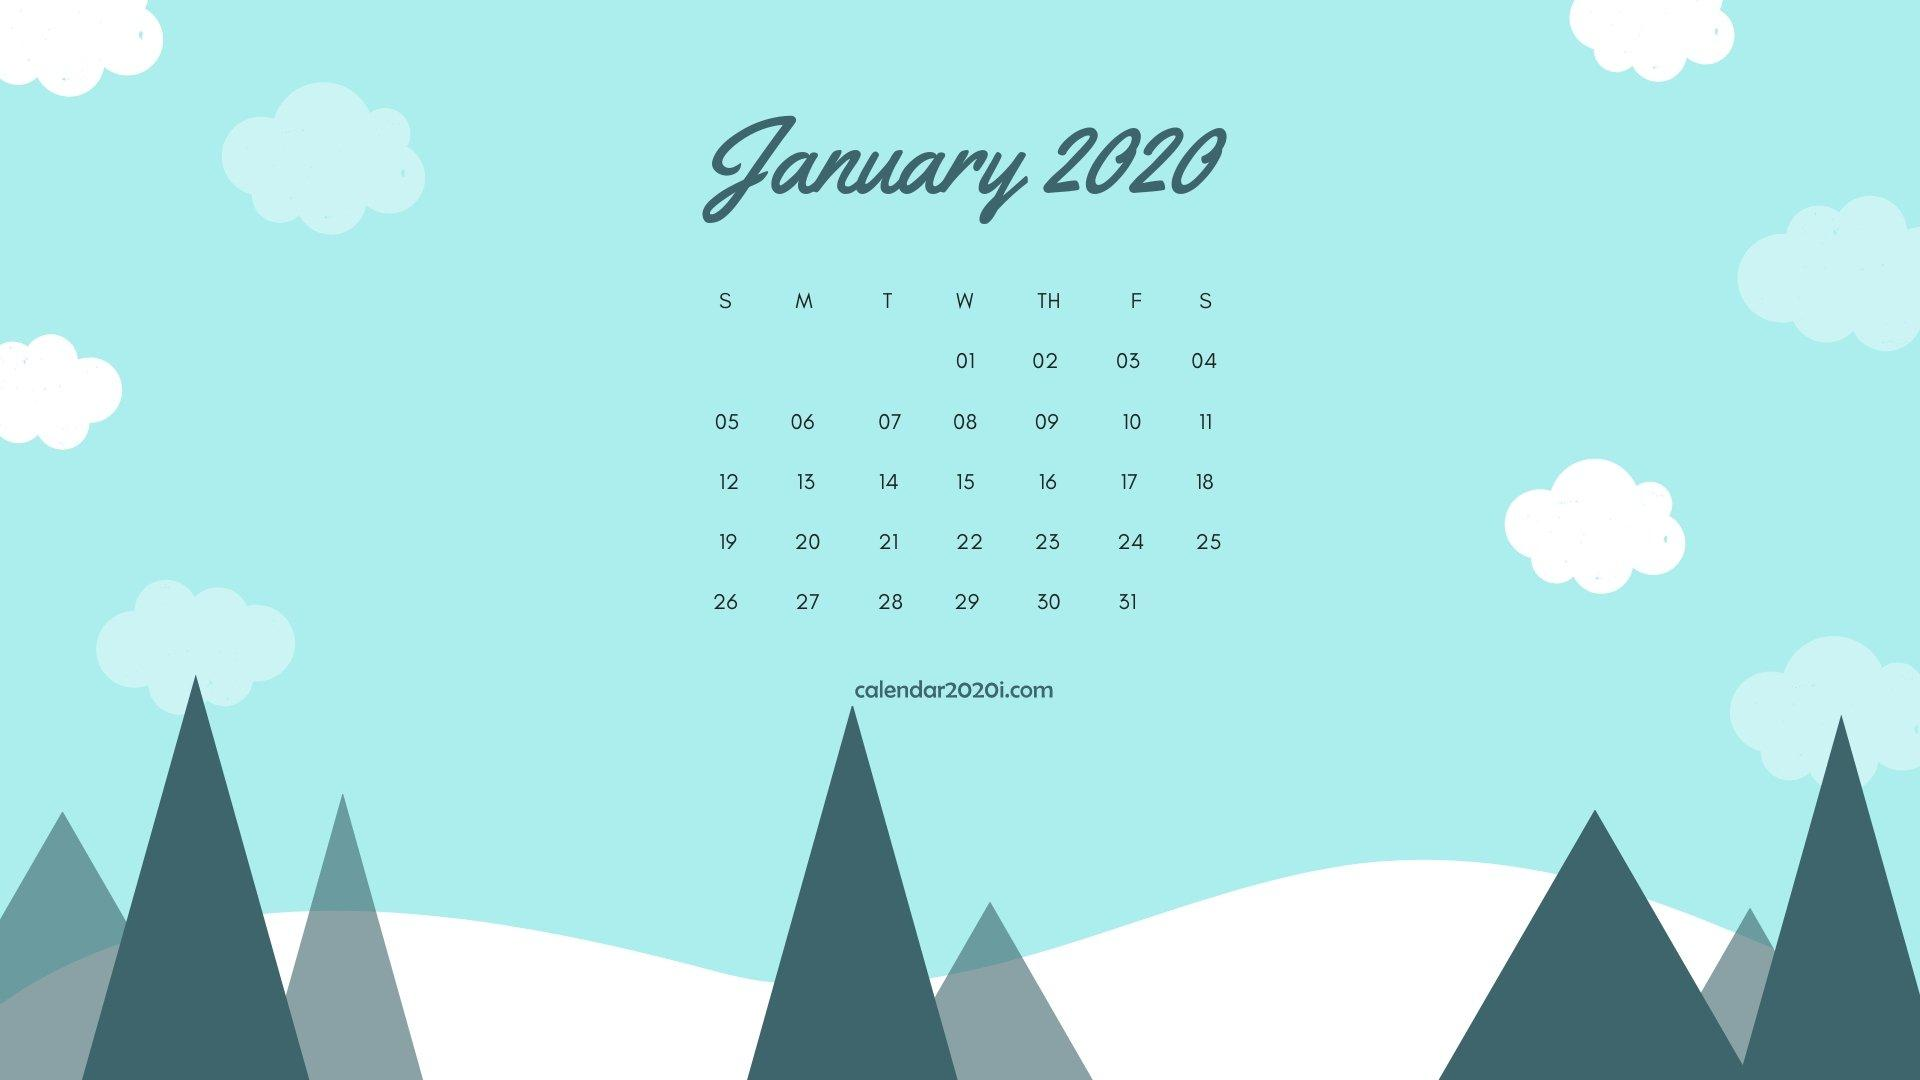 Calendar 2020 Wallpapers - Wallpaper Cave